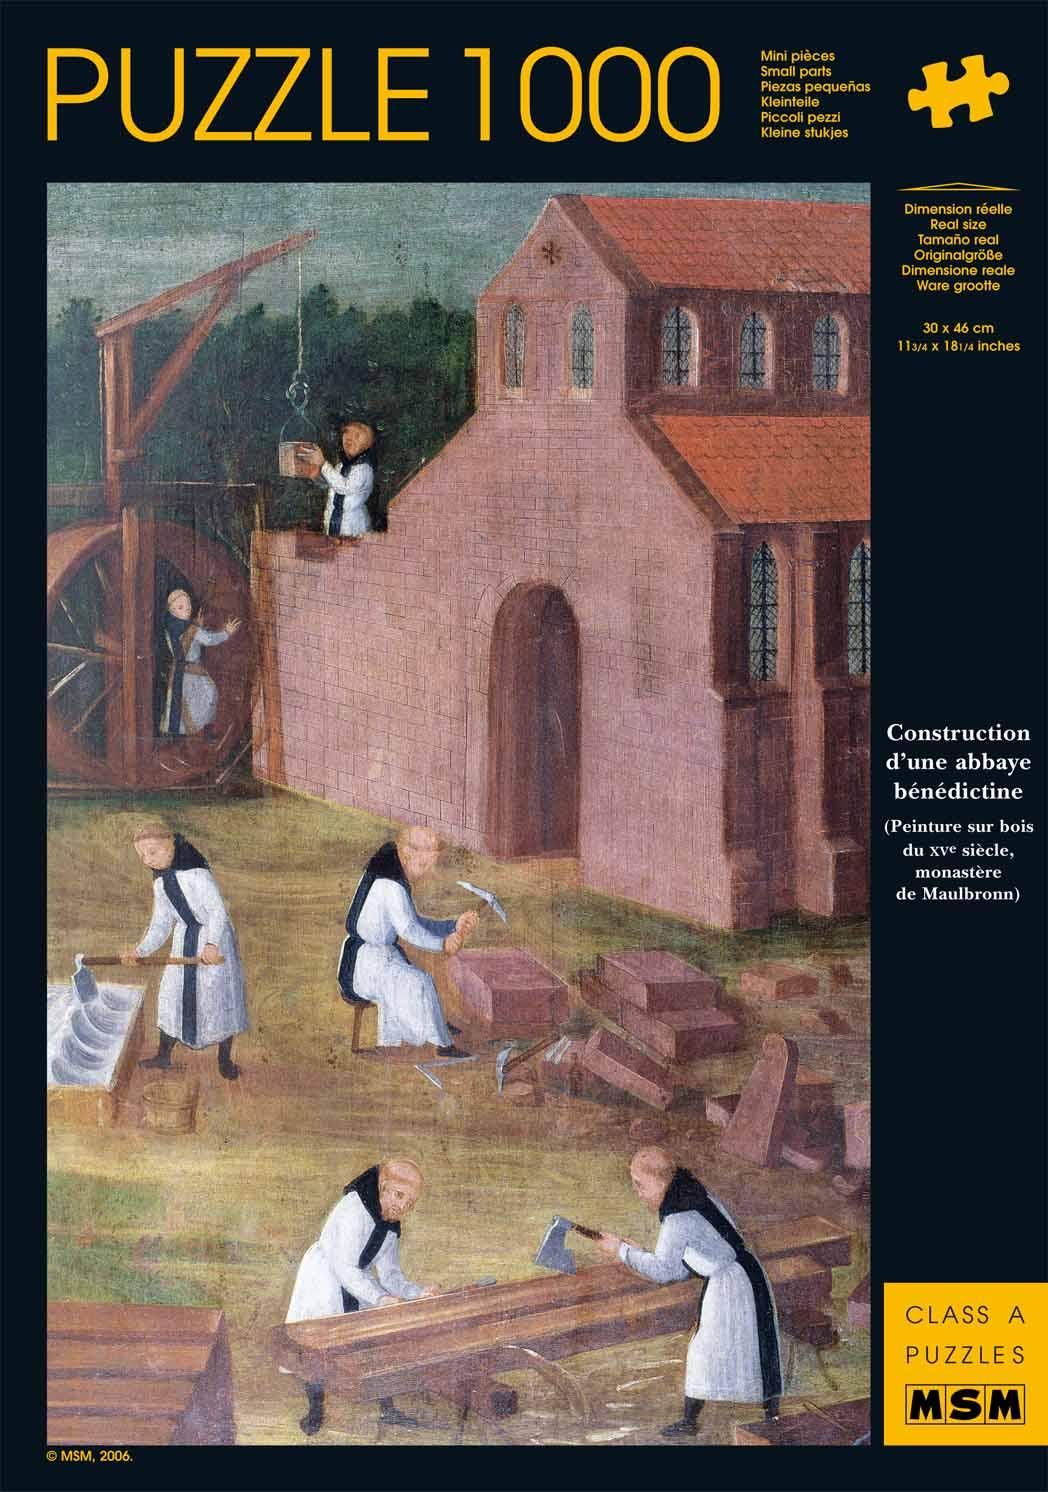 Construction d'une abbaye